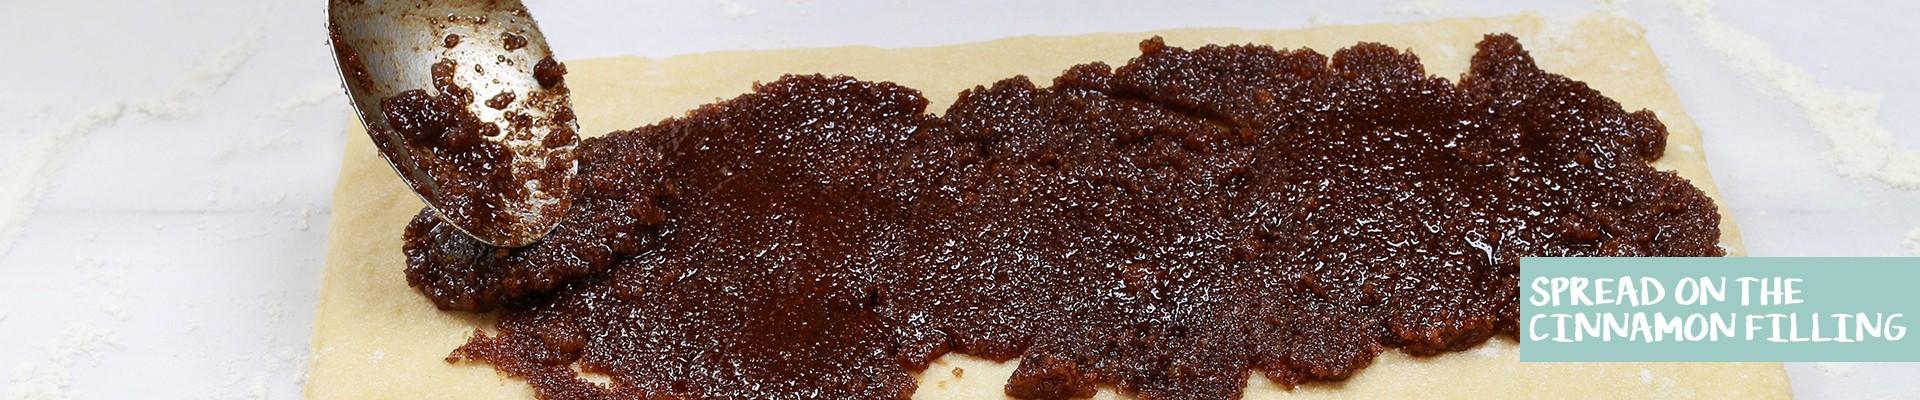 spread on the cinnamon filling